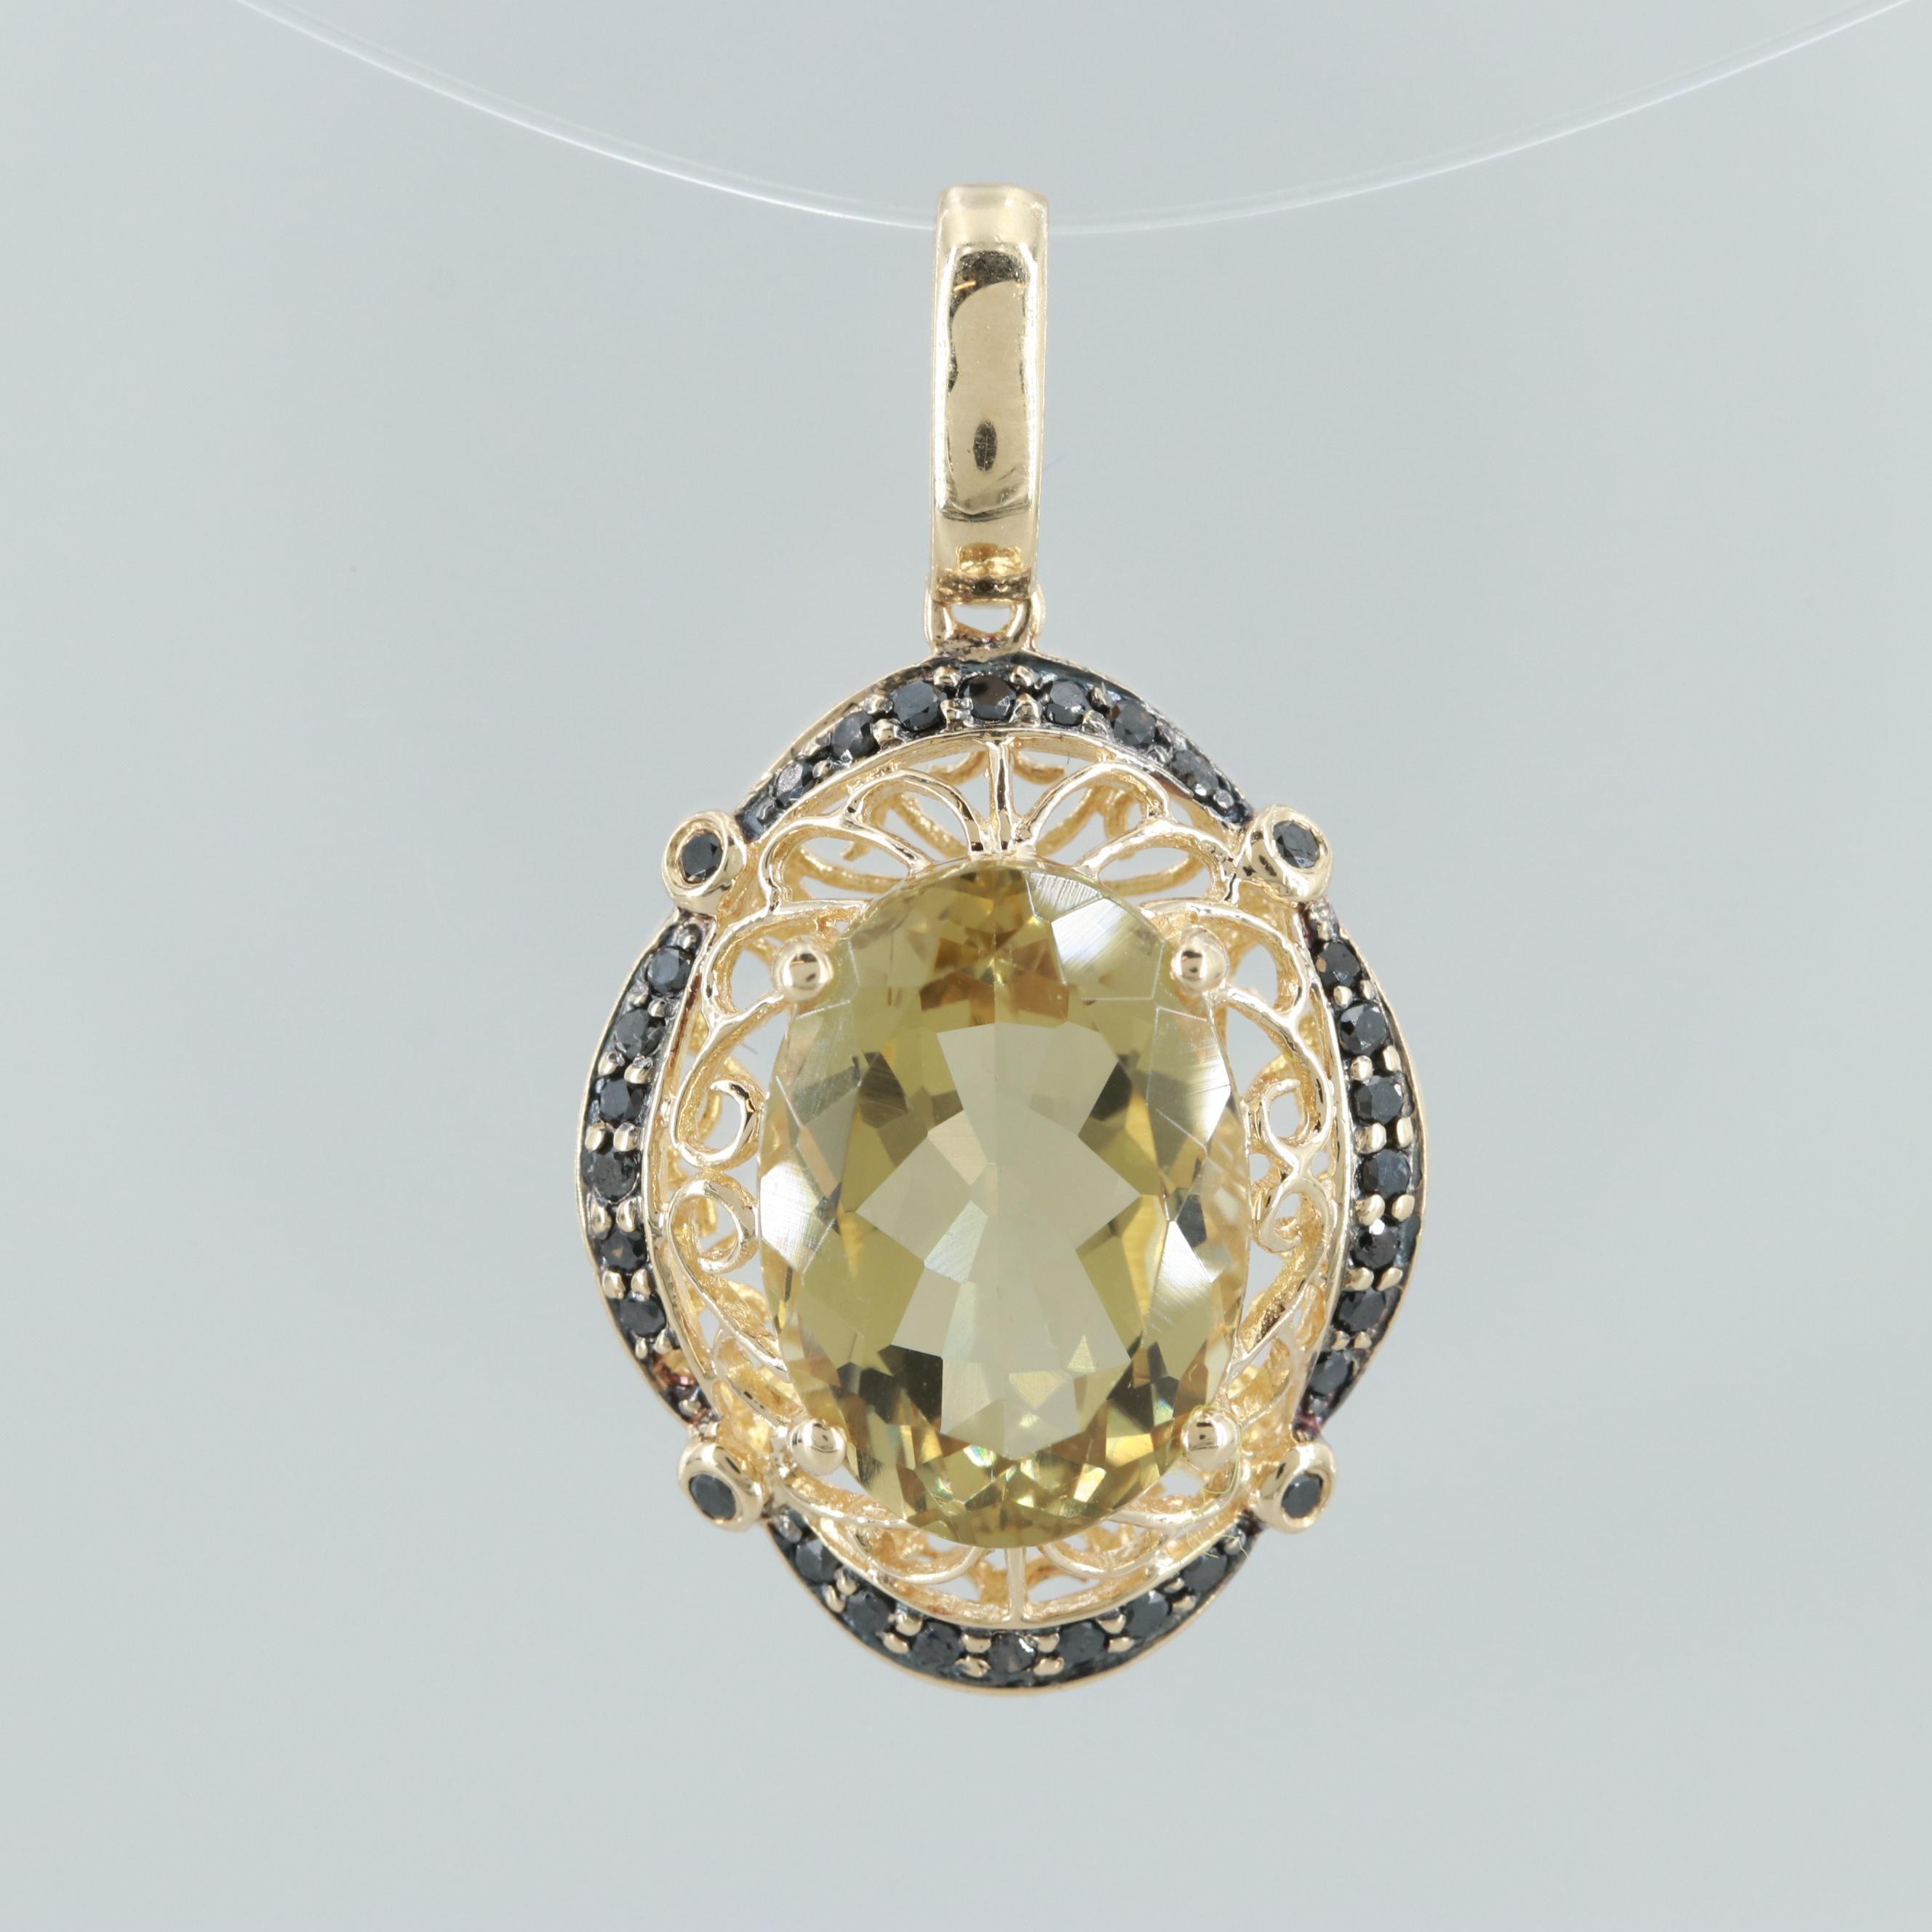 14K Yellow Gold Citrine and Black Diamond Pendant